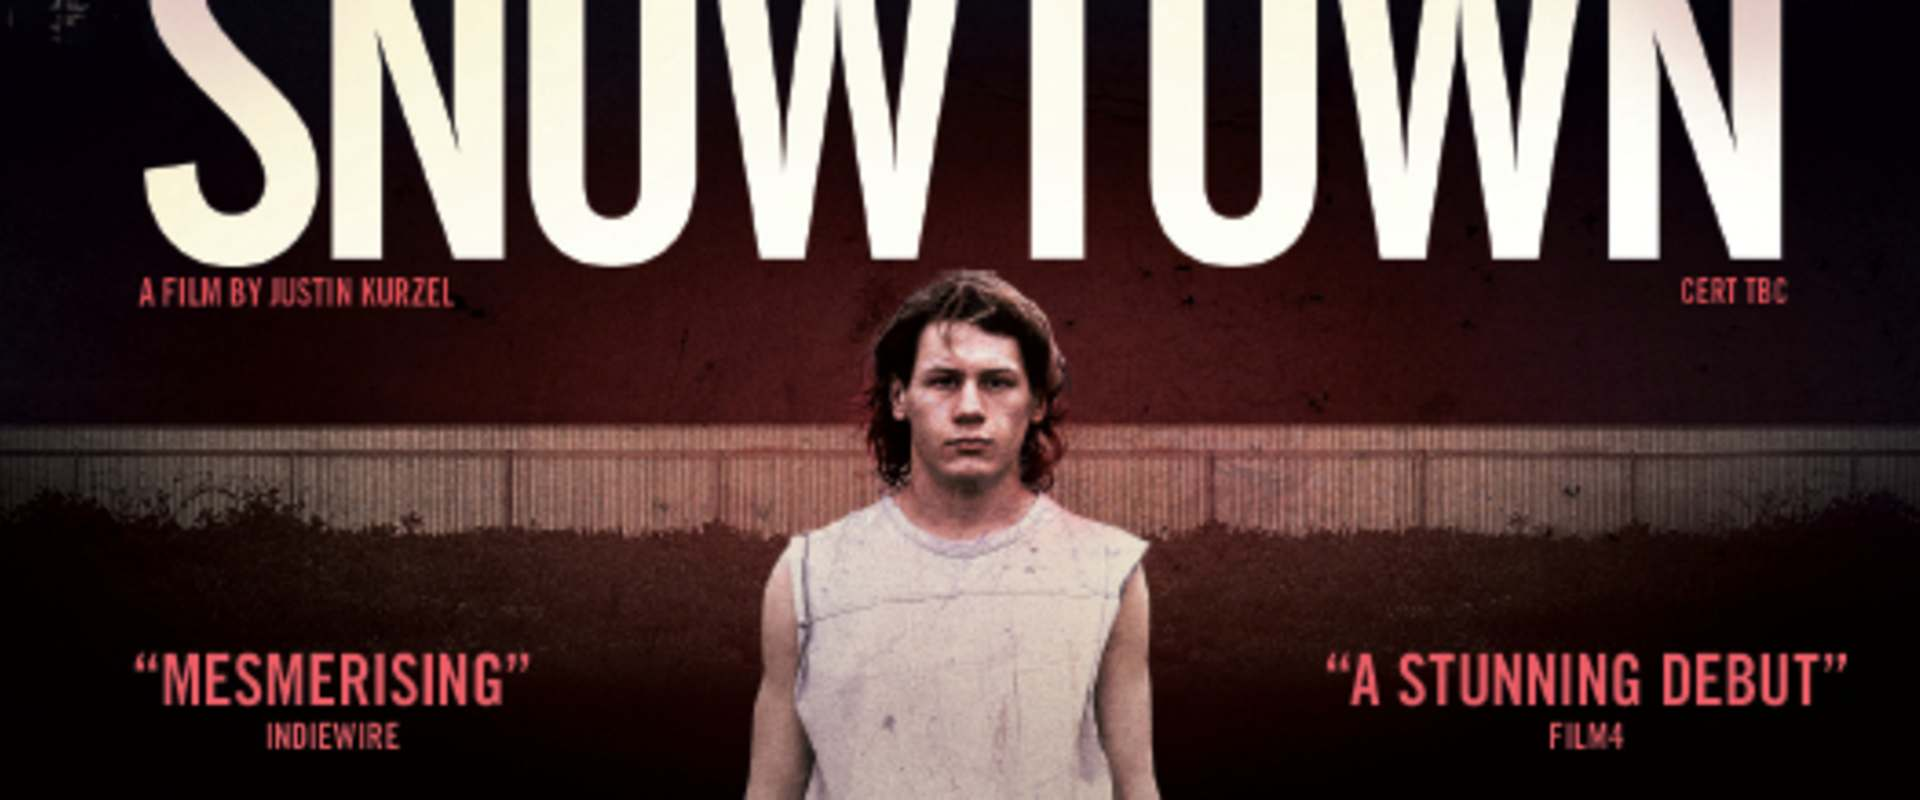 Watch The Snowtown Murders on Netflix Today! | NetflixMovies com